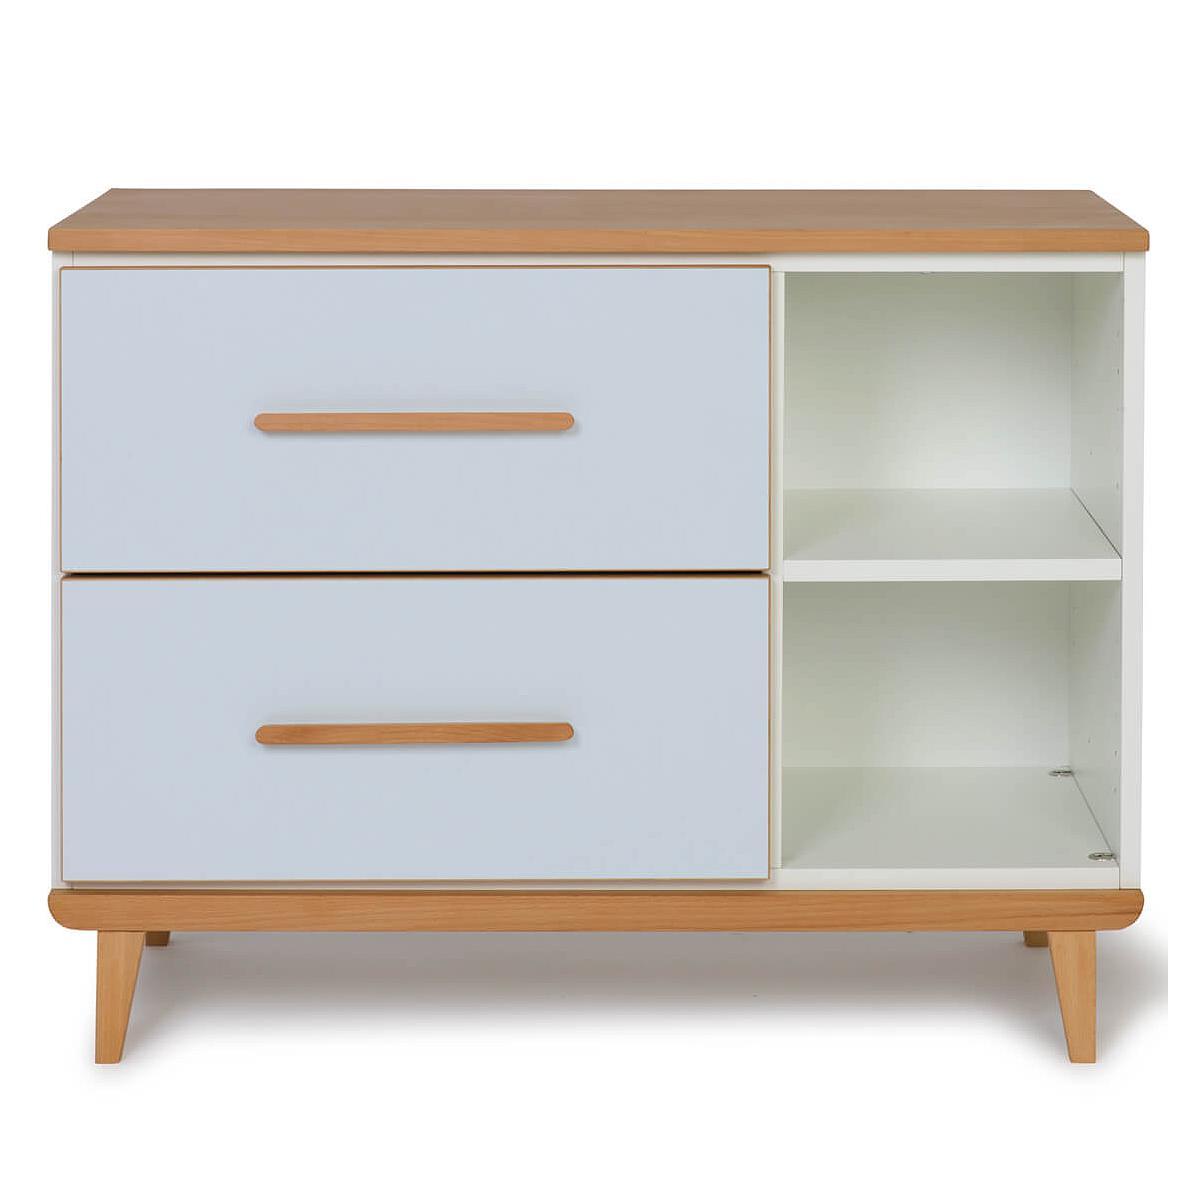 Wookids - Petit meuble 2 tiroirs NADO sky blue